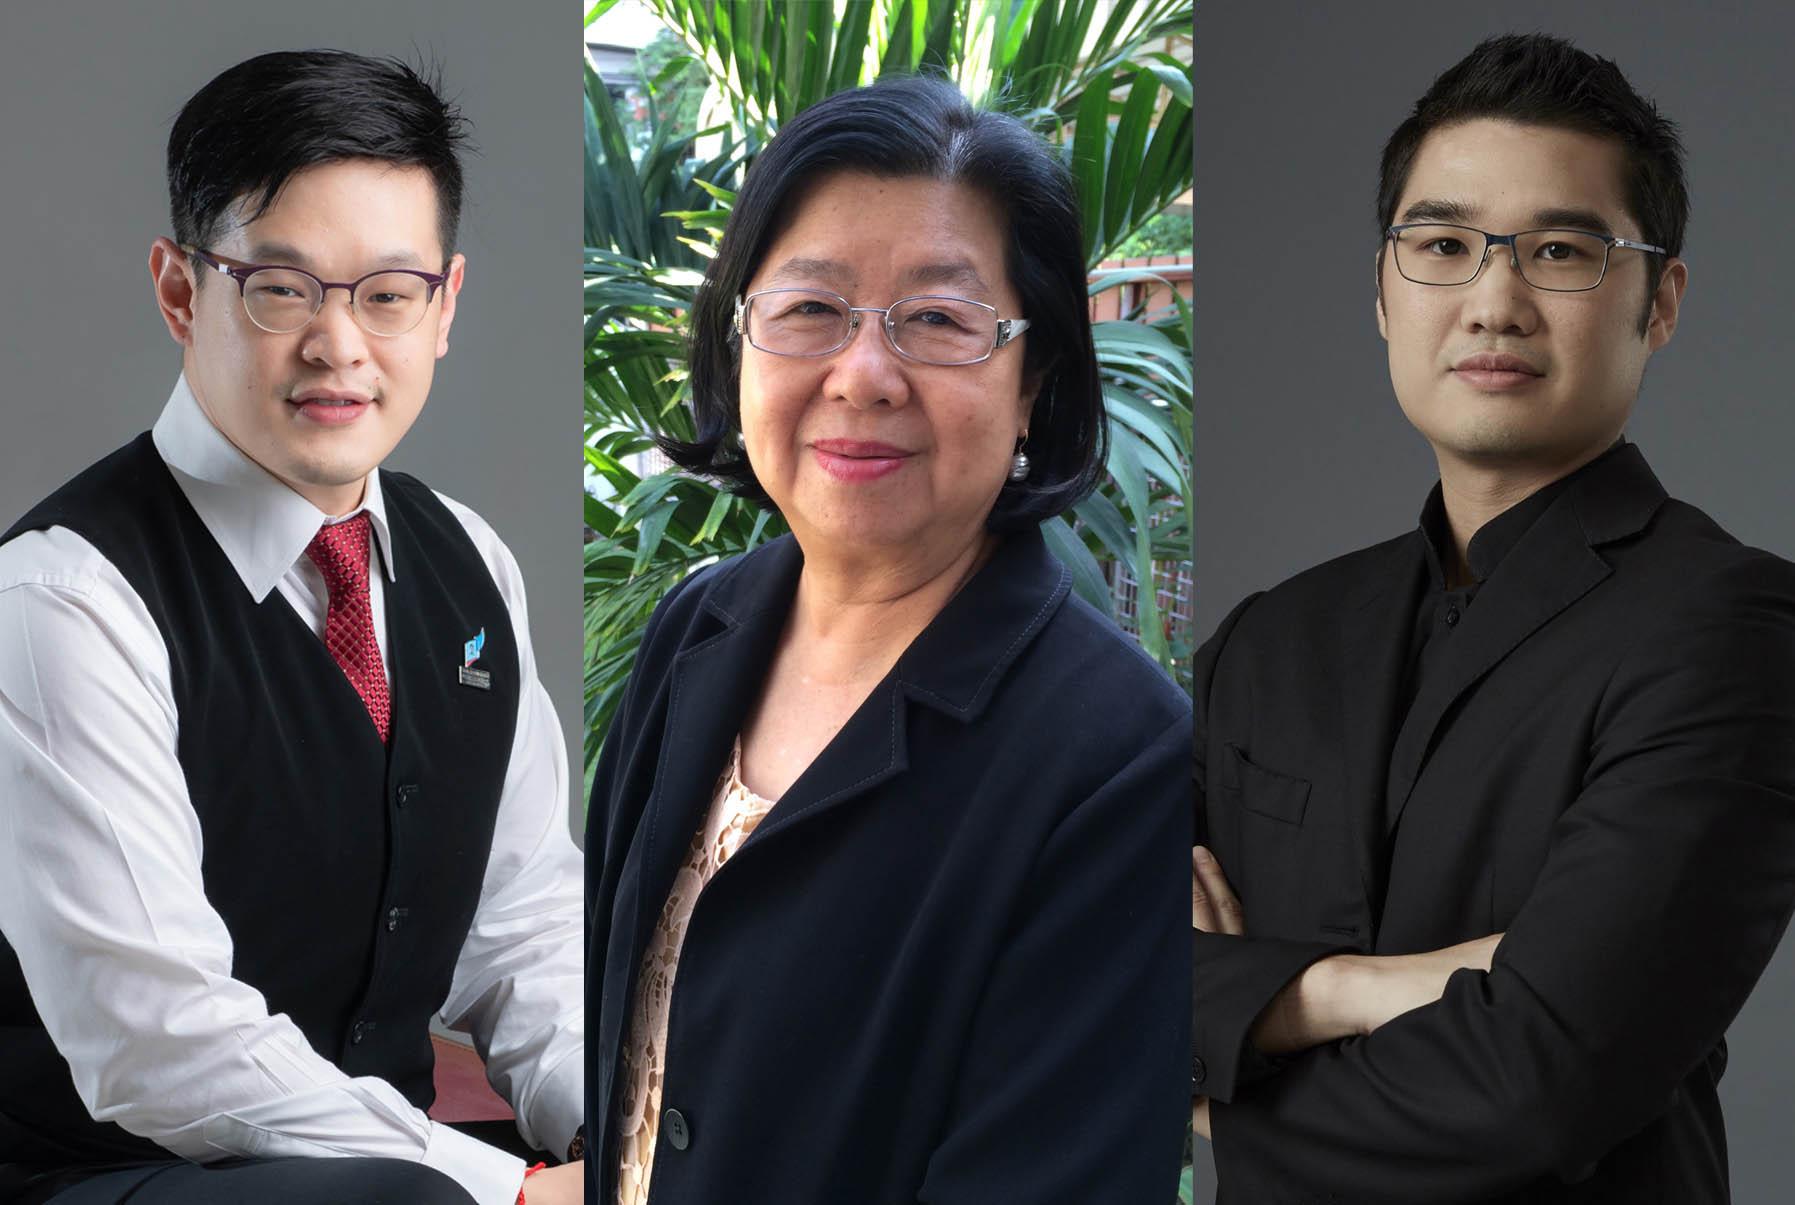 Chula reveals new concept to boost Thai participation in anti-corruption